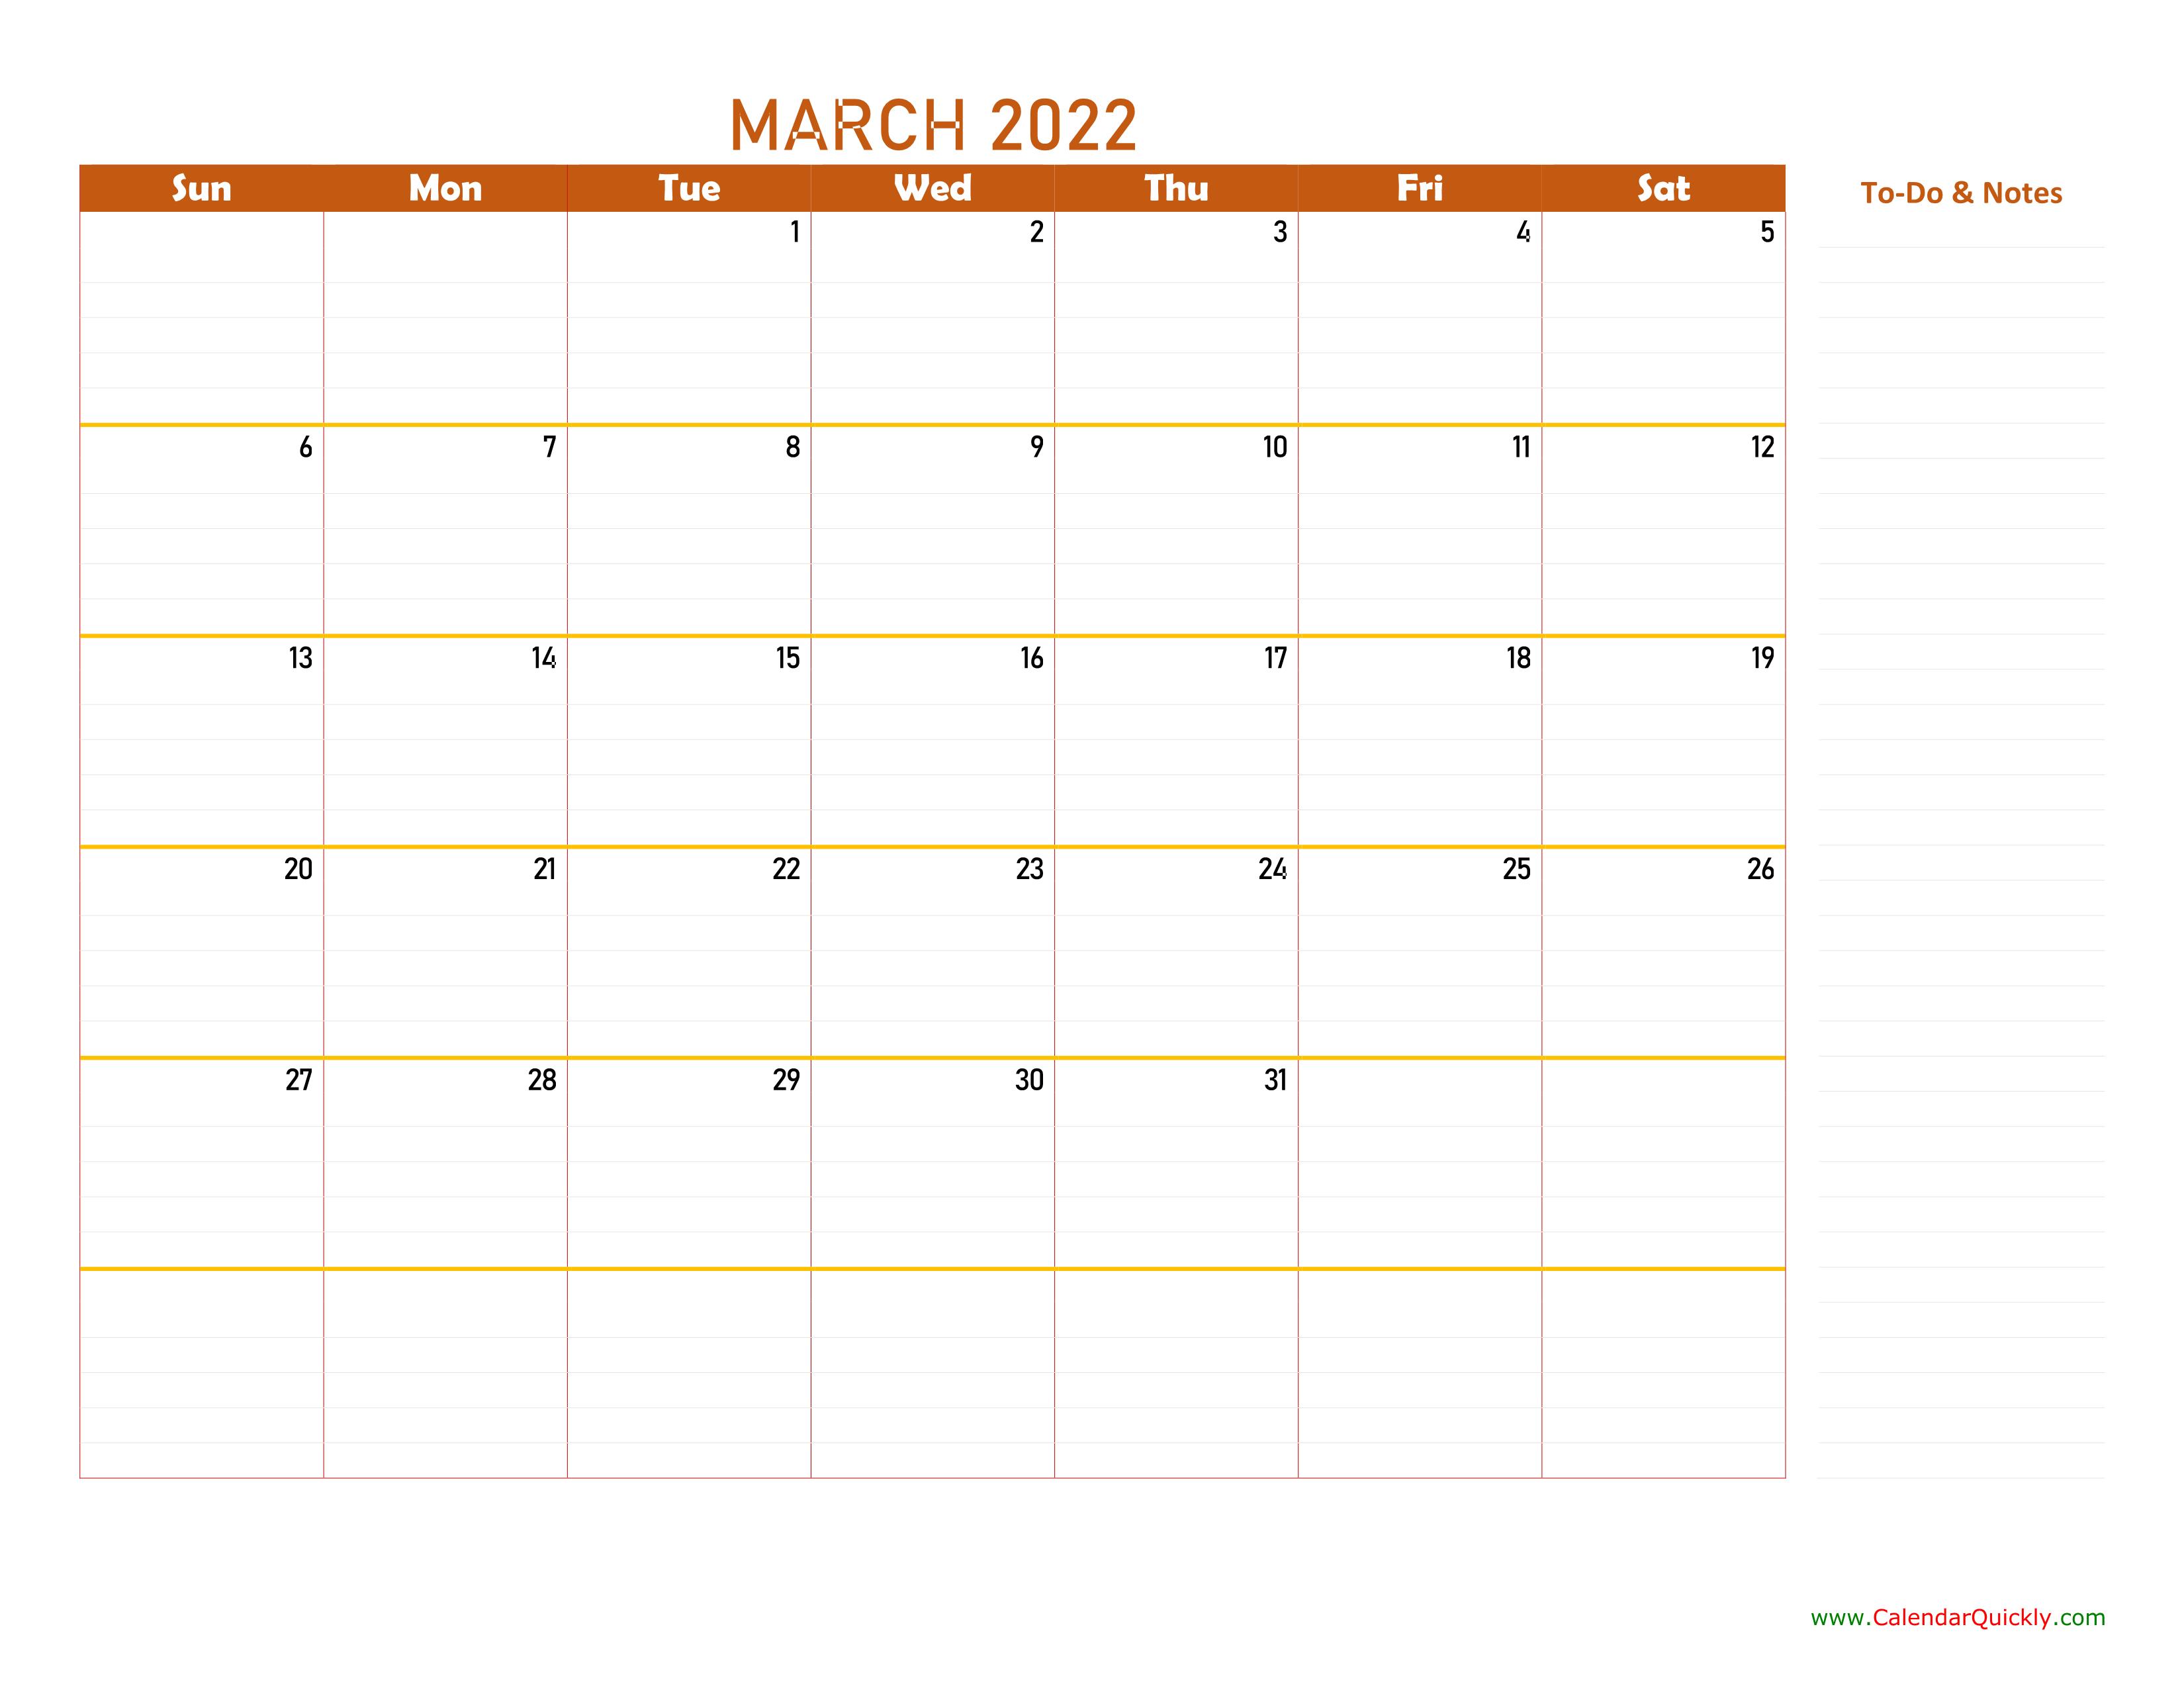 March 2022 Calendar | Calendar Quickly with Print Calendar March 2022